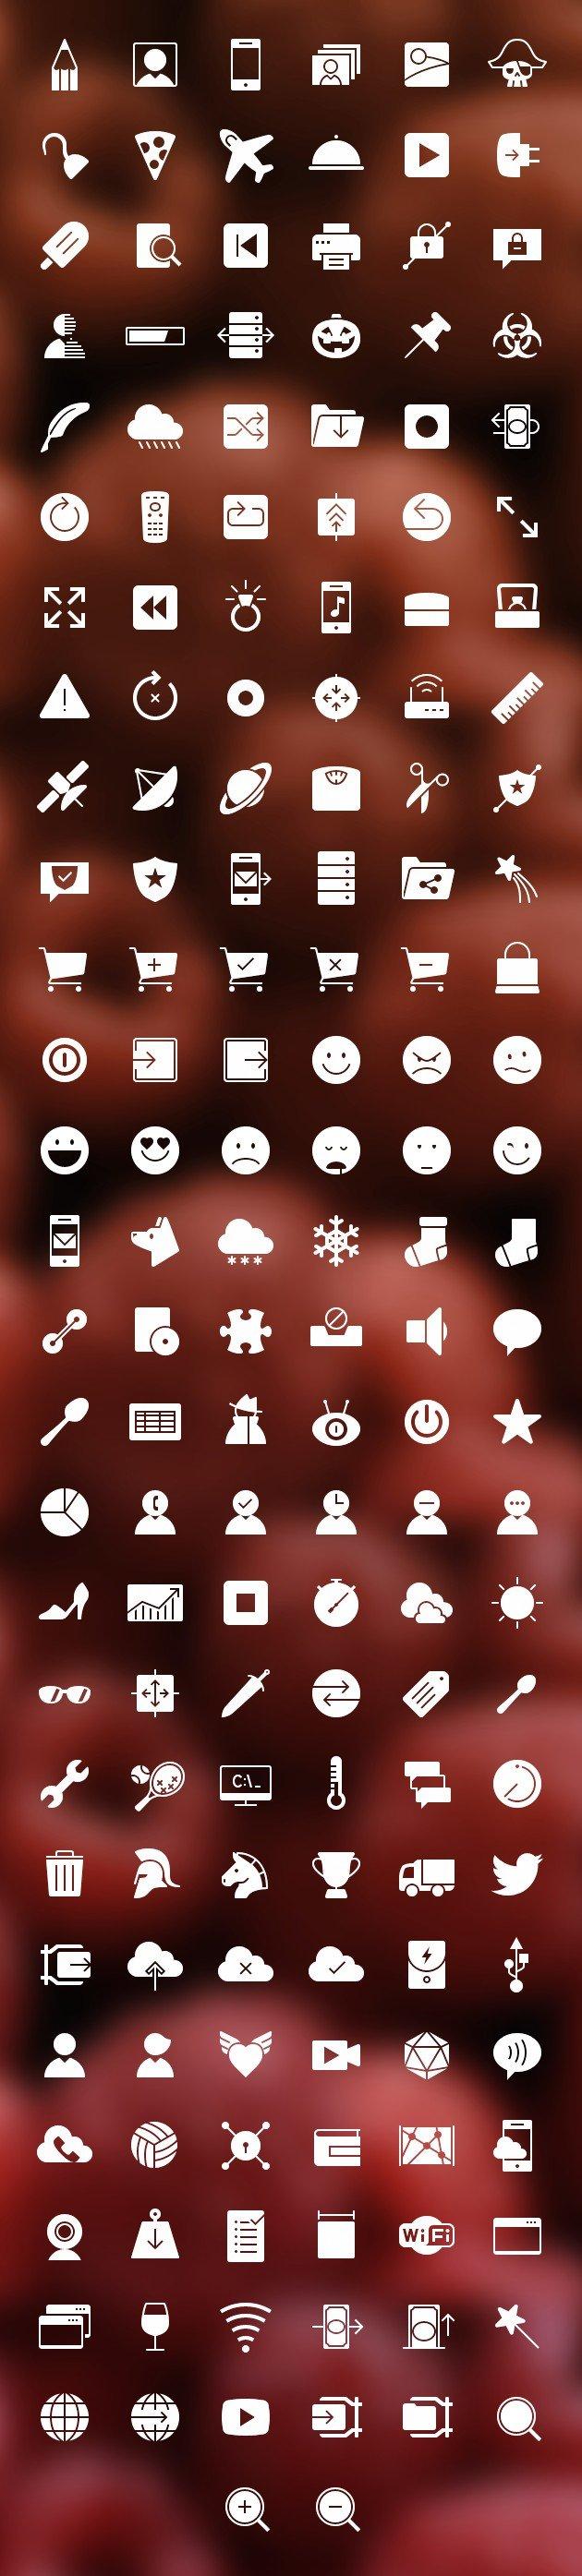 12 000 Outlined Icons (.Psd + .Png) скачать бесплатно